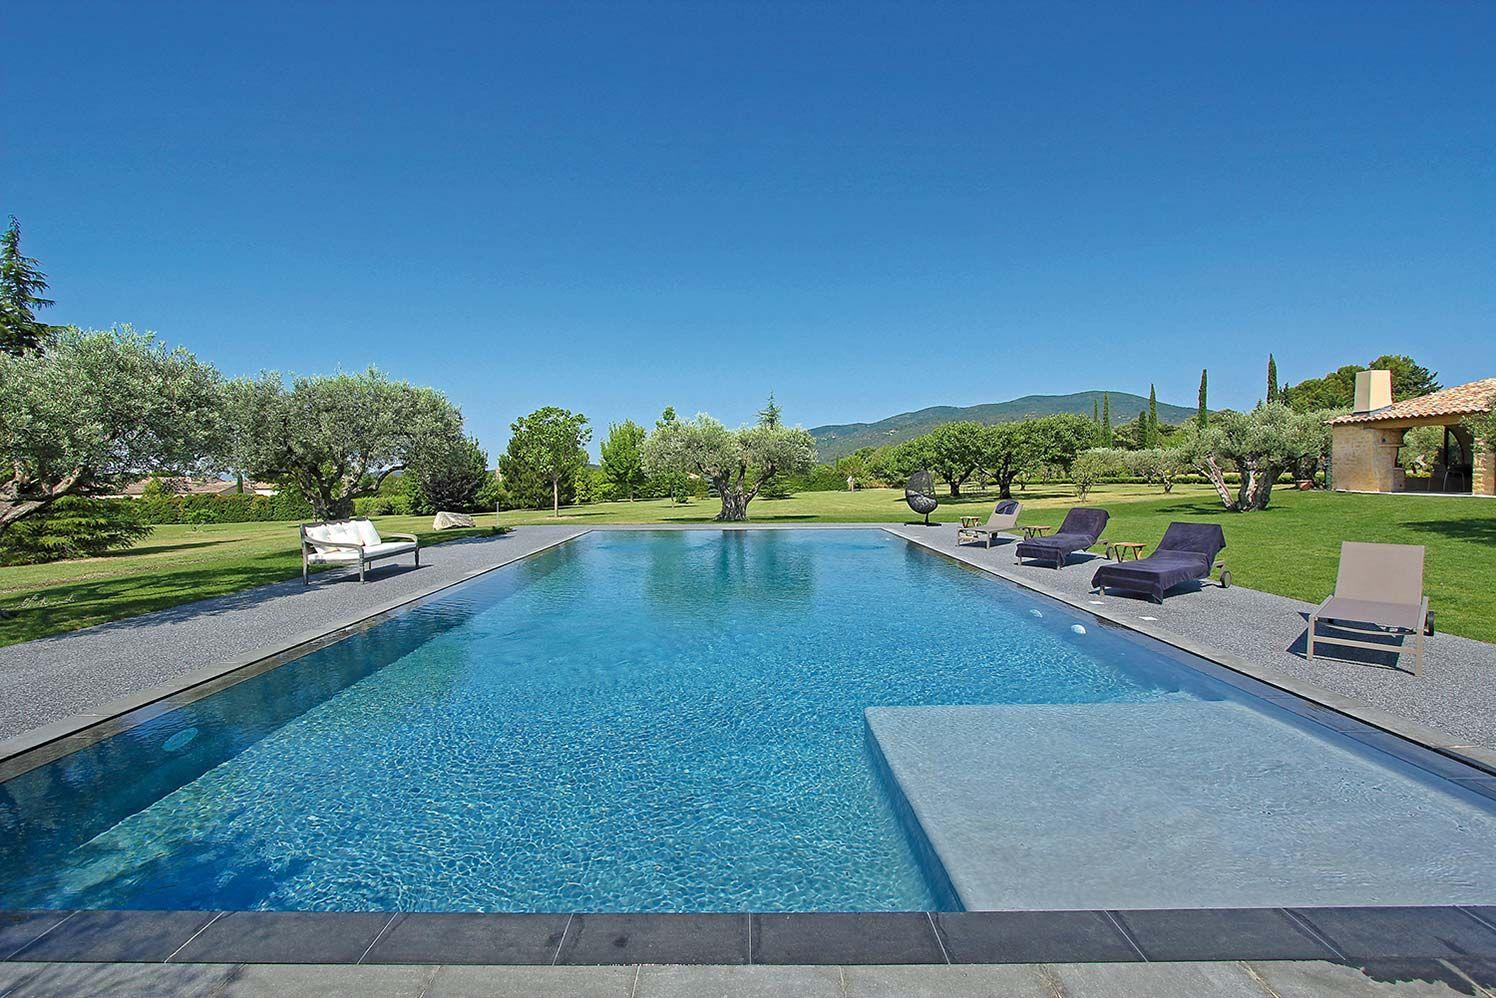 La piscine petite note contemporaine en 2018 piscine pinterest margelle pierre de lave - Piscine debordement ...